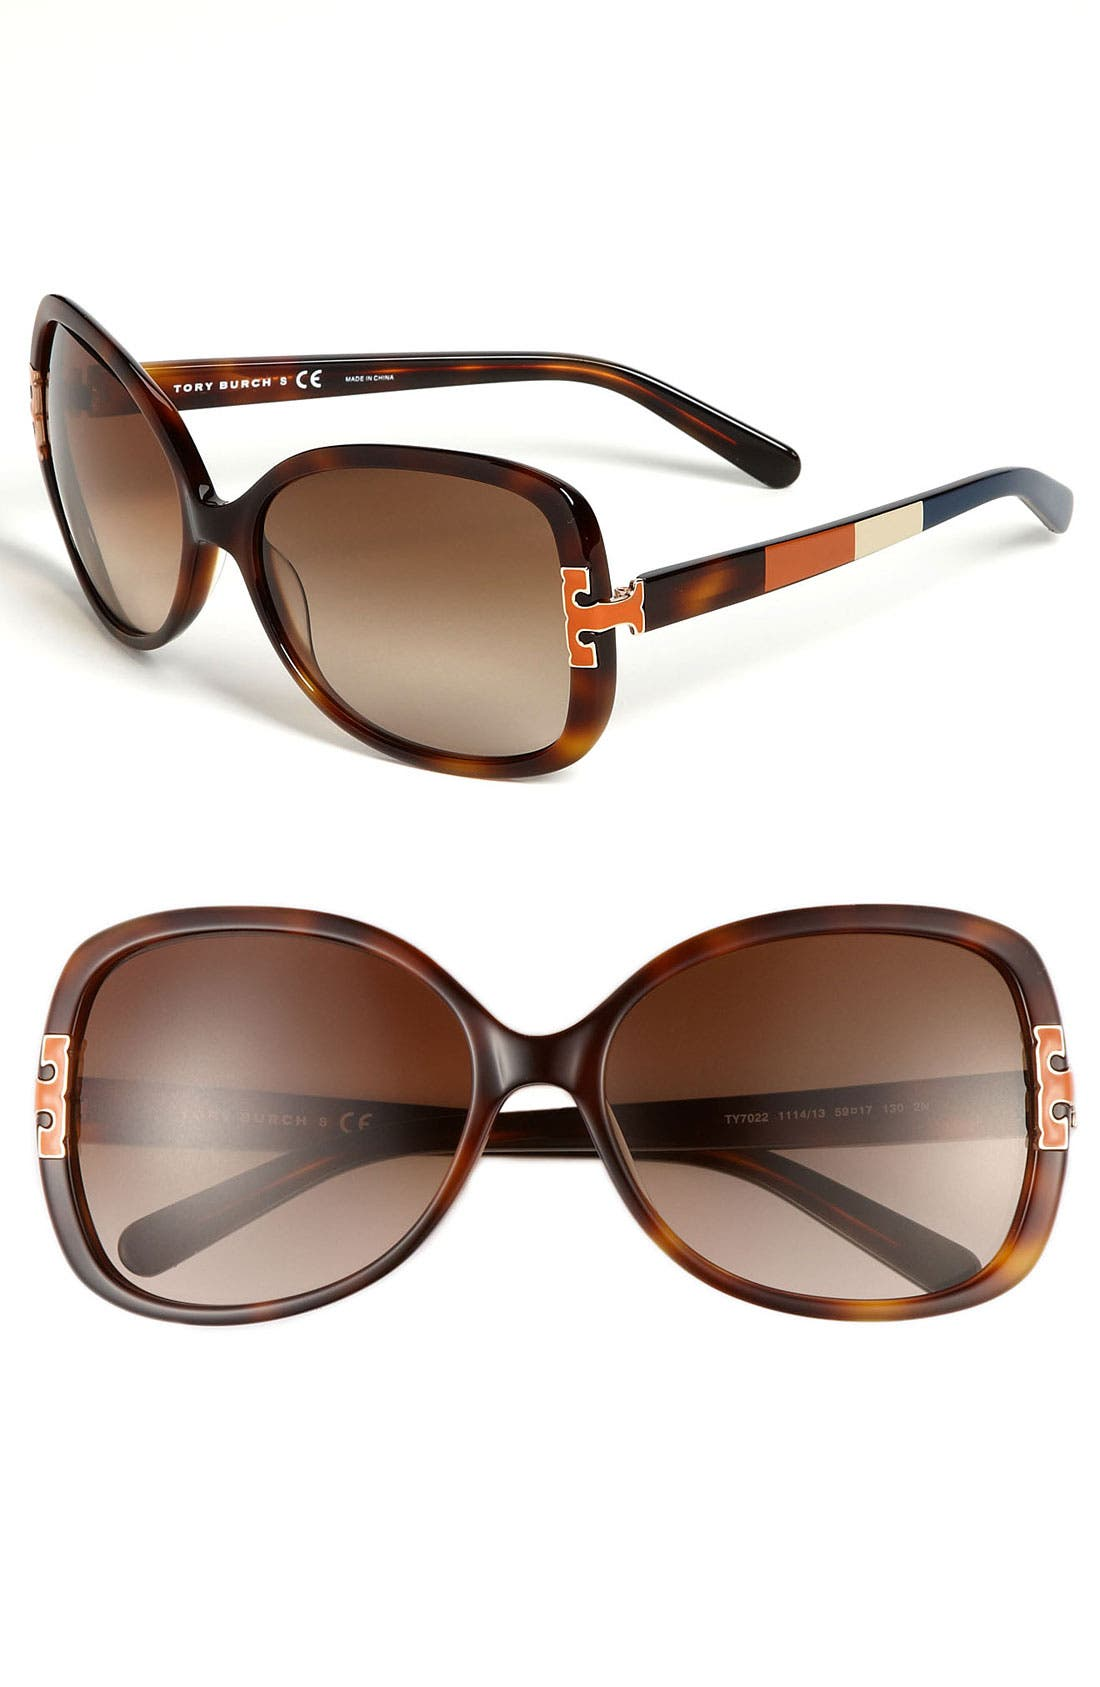 Alternate Image 1 Selected - Tory Burch 59mm Oversized Sunglasses